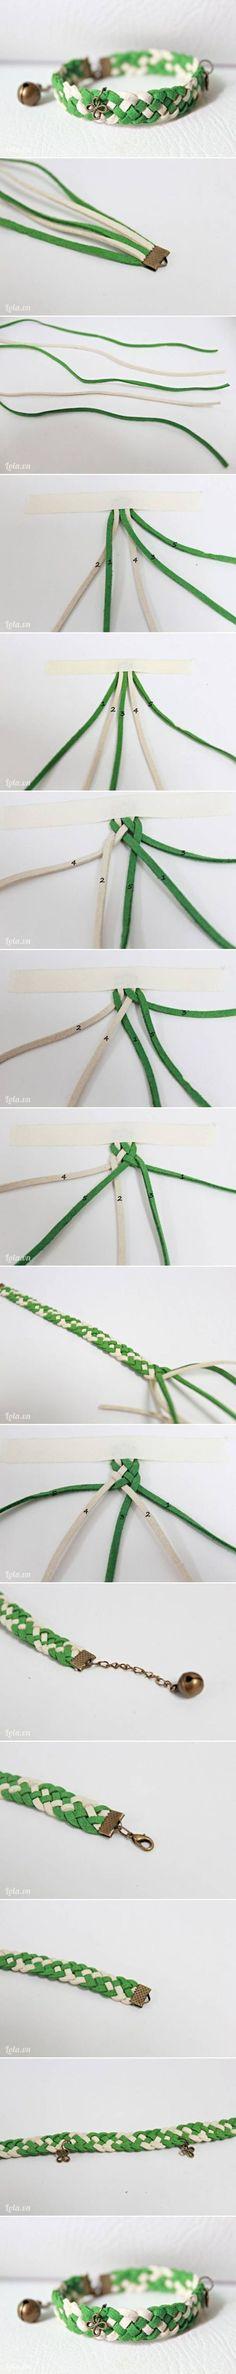 DIY leather braided bracelet Five strand braid